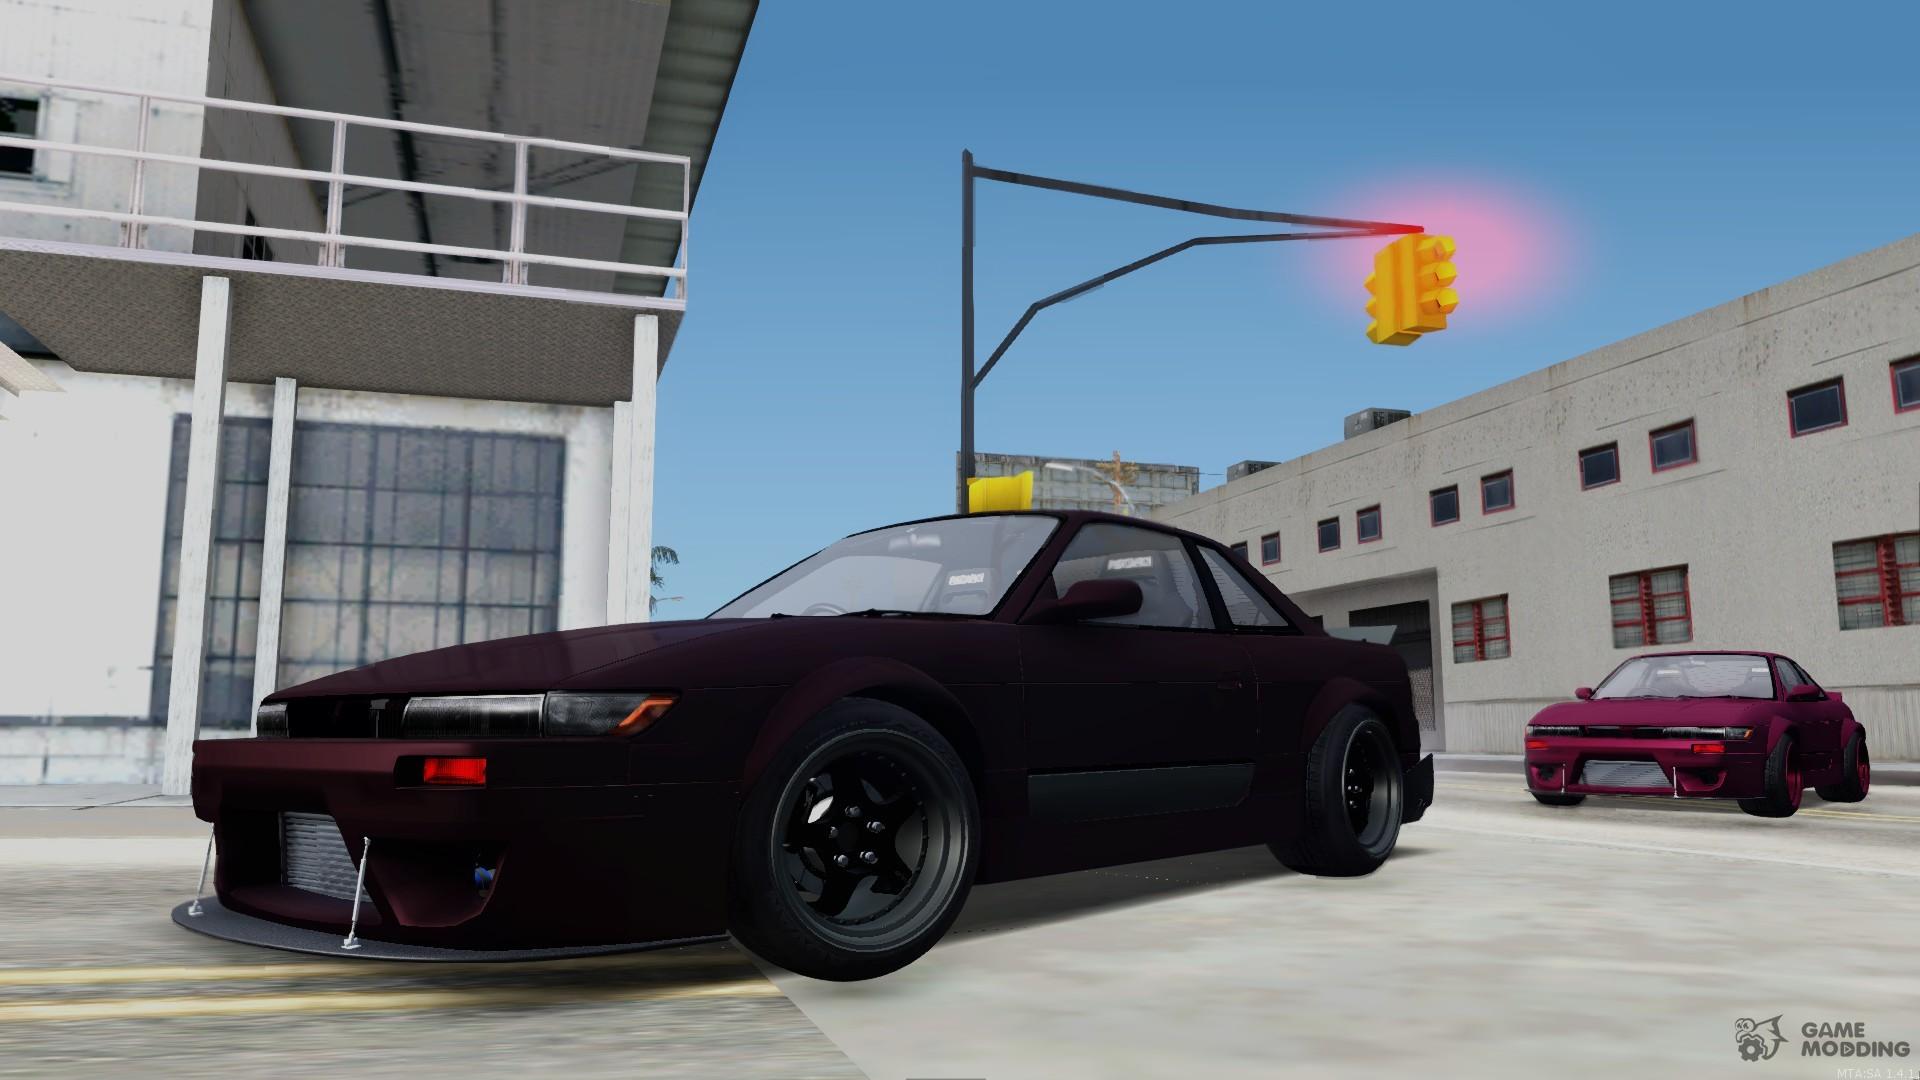 Nissan Silvia S13 Rocket Bunny for GTA San Andreas